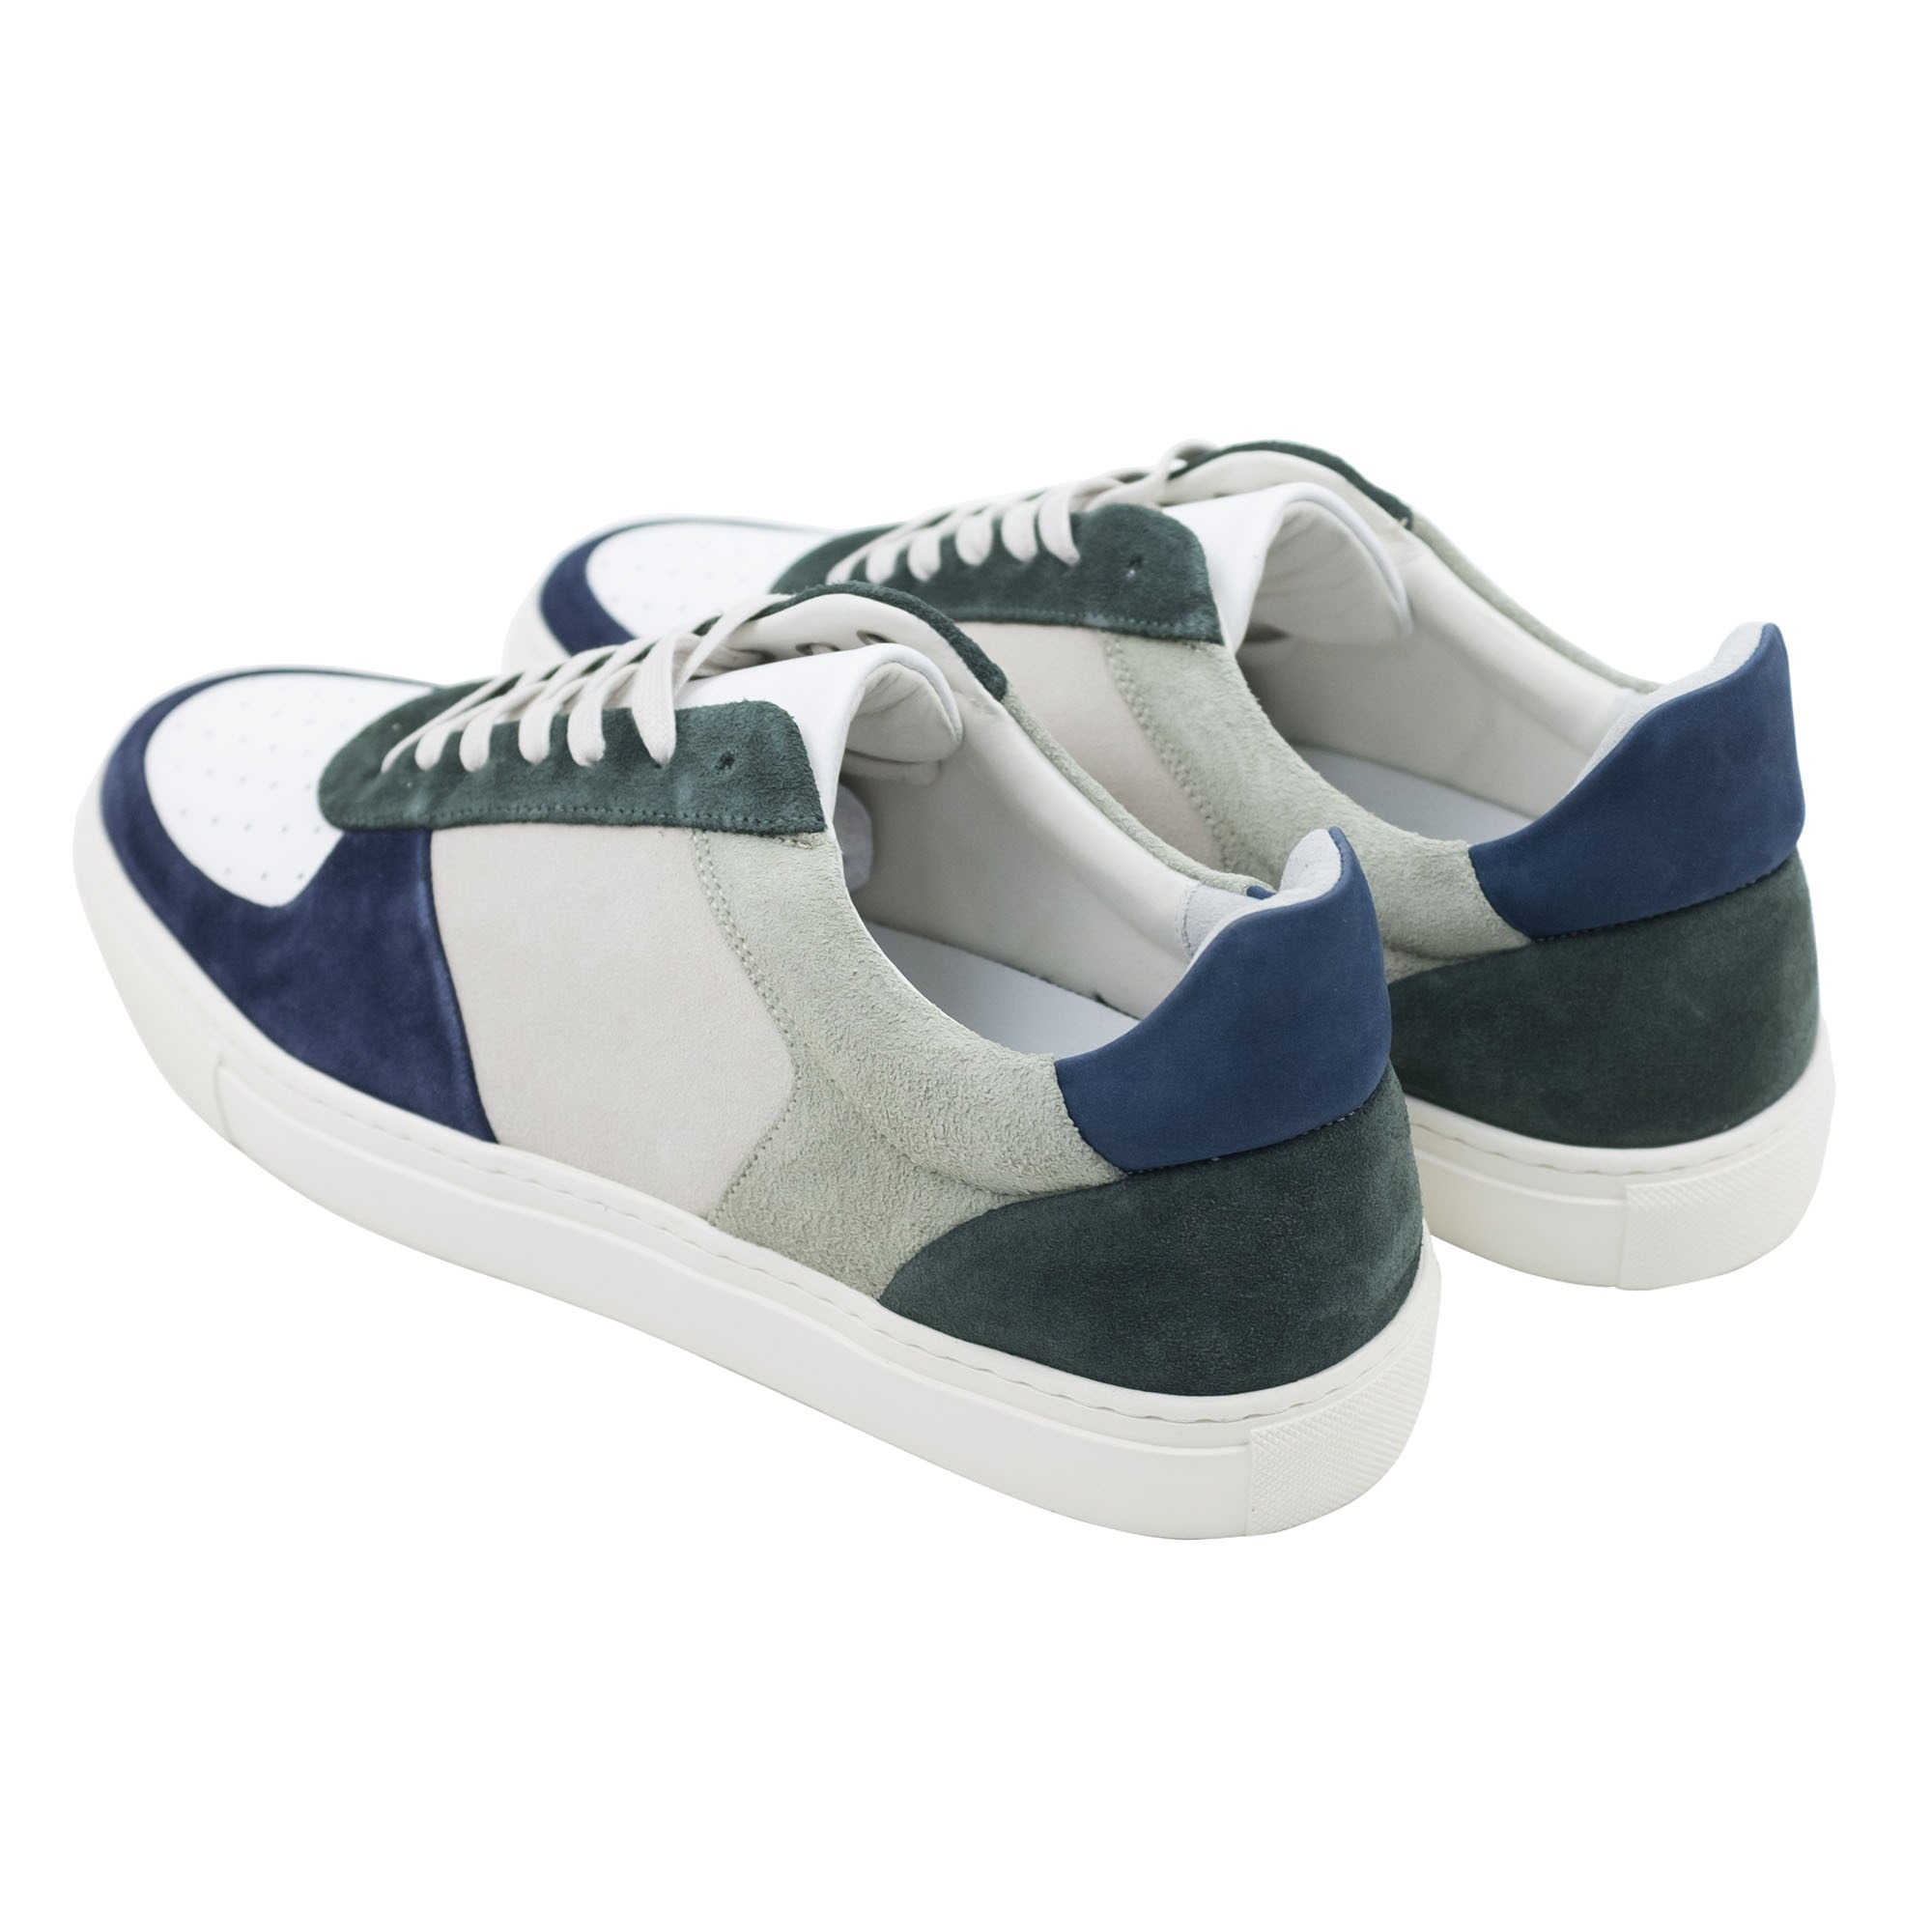 Filippa K Robert Low Mix Sneaker - Limestone/Navy/White Mix